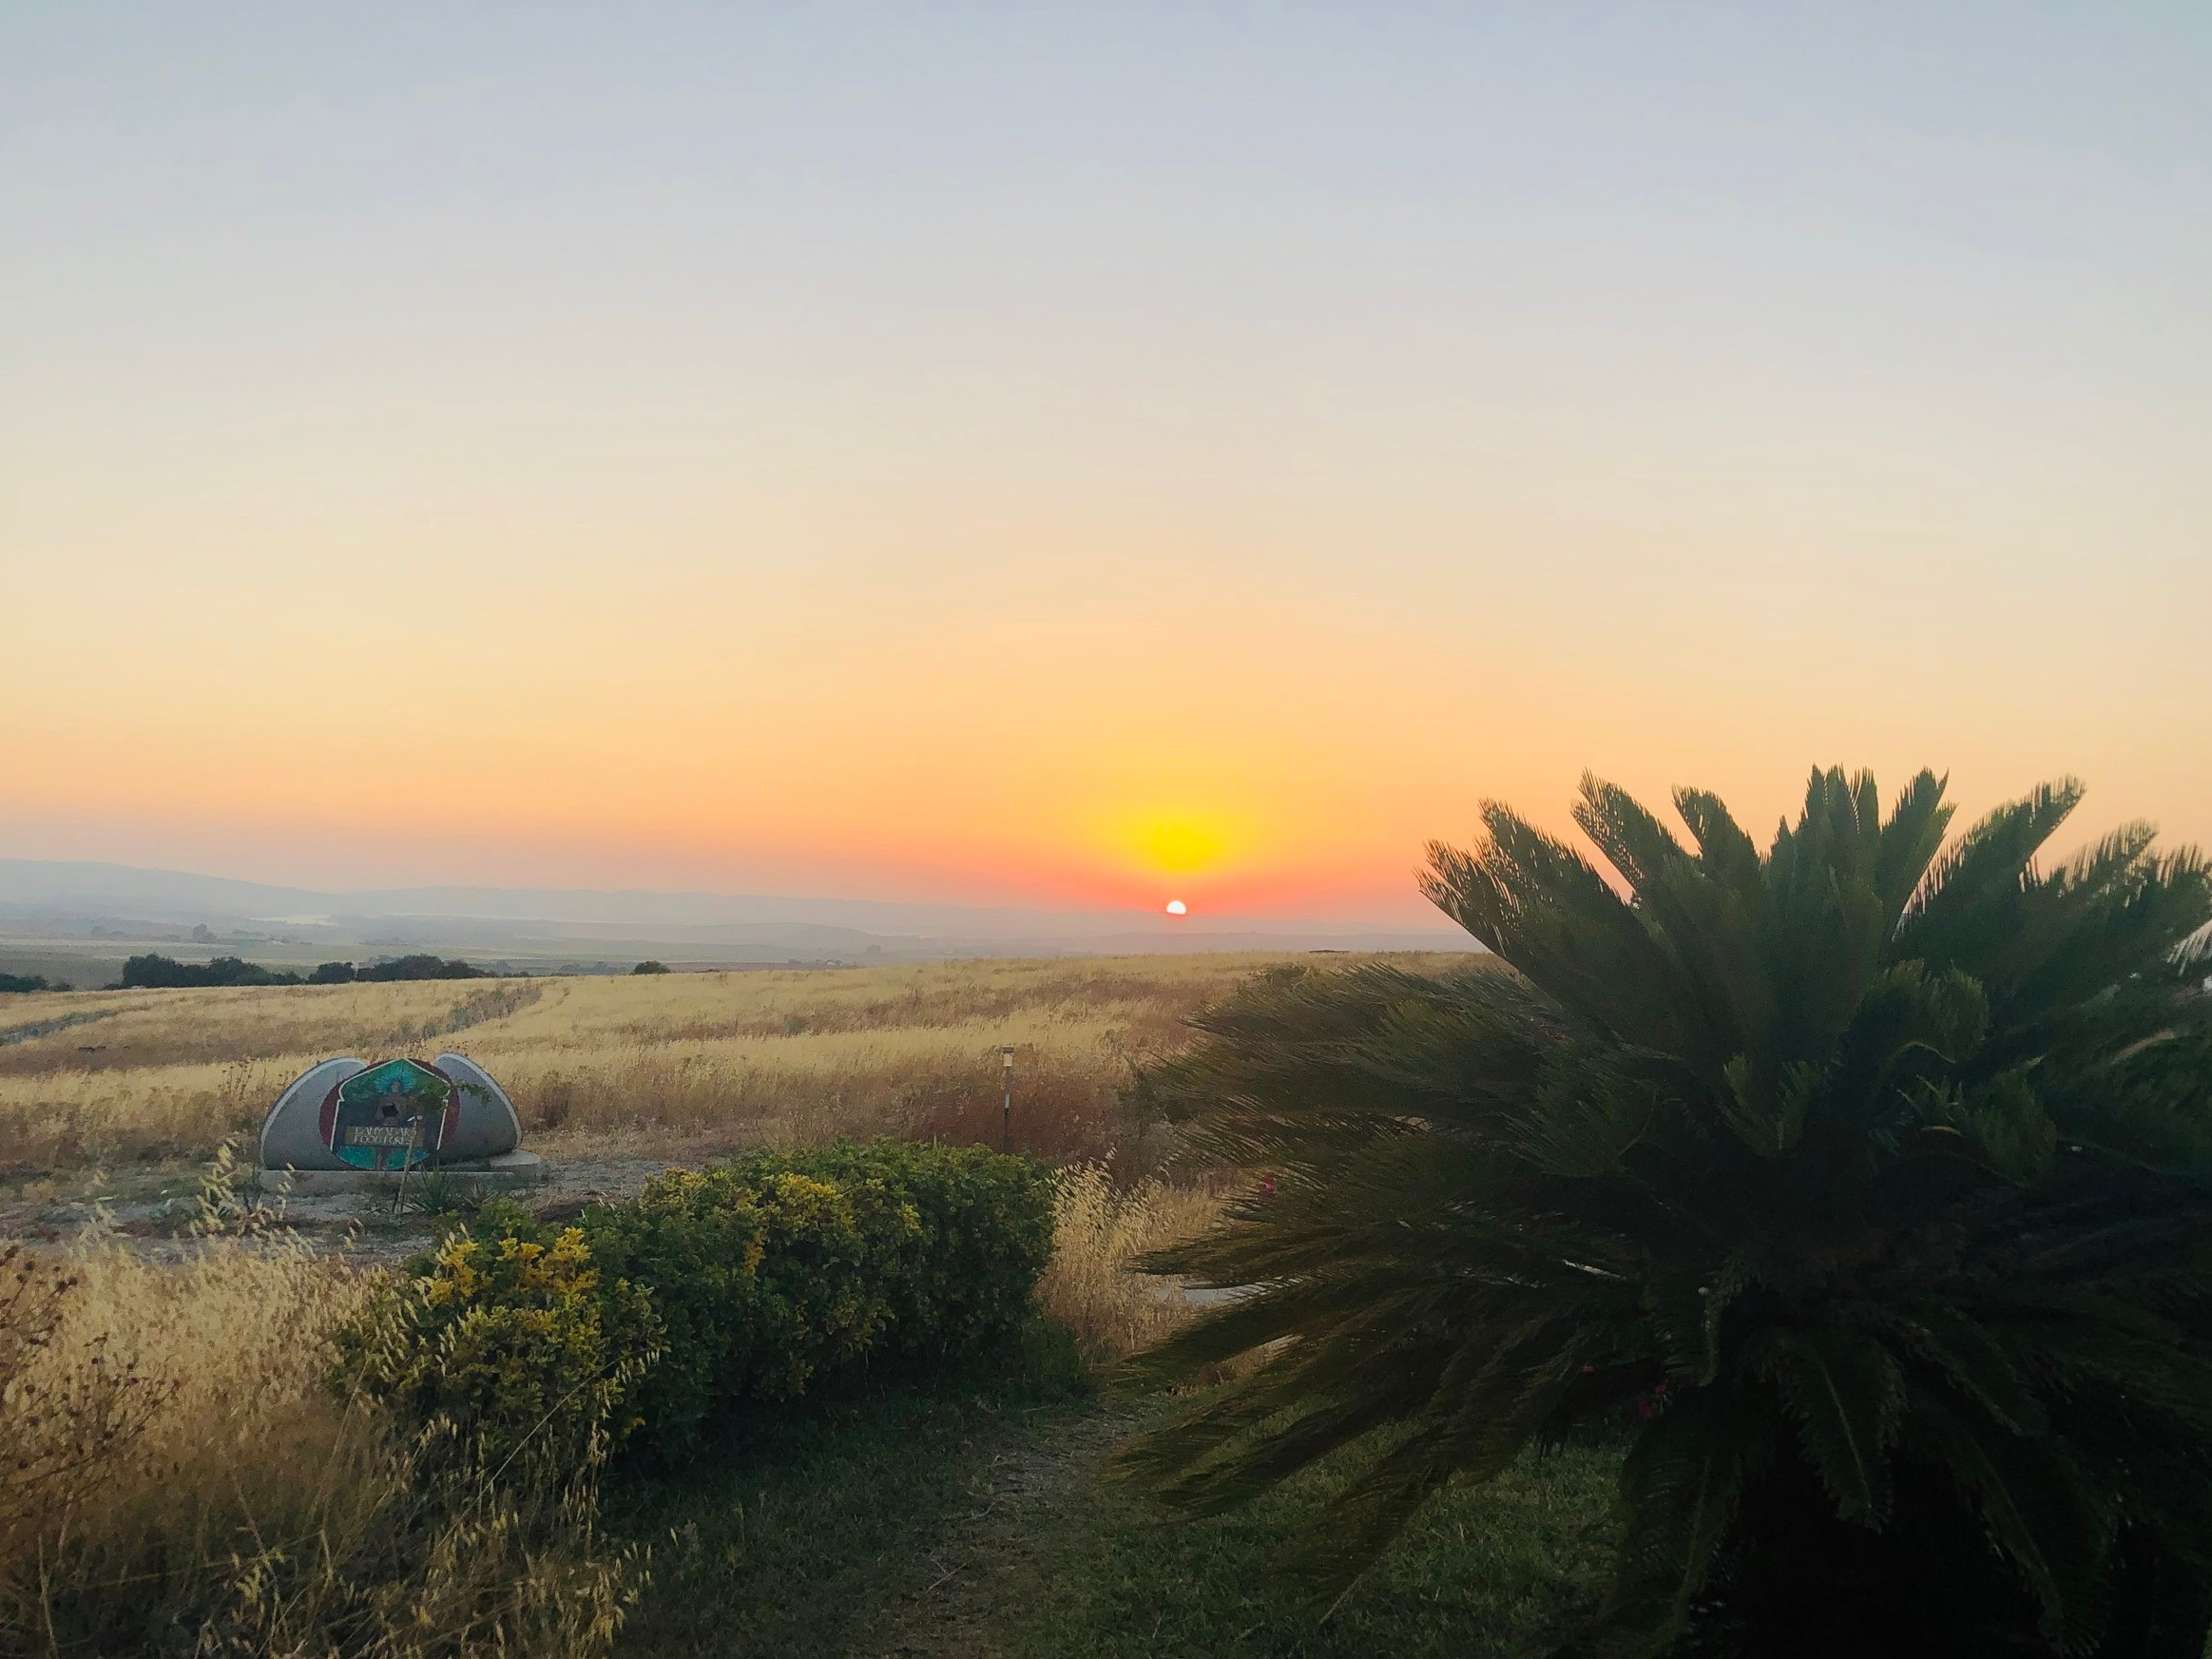 Sunset at Suryalila… no words.